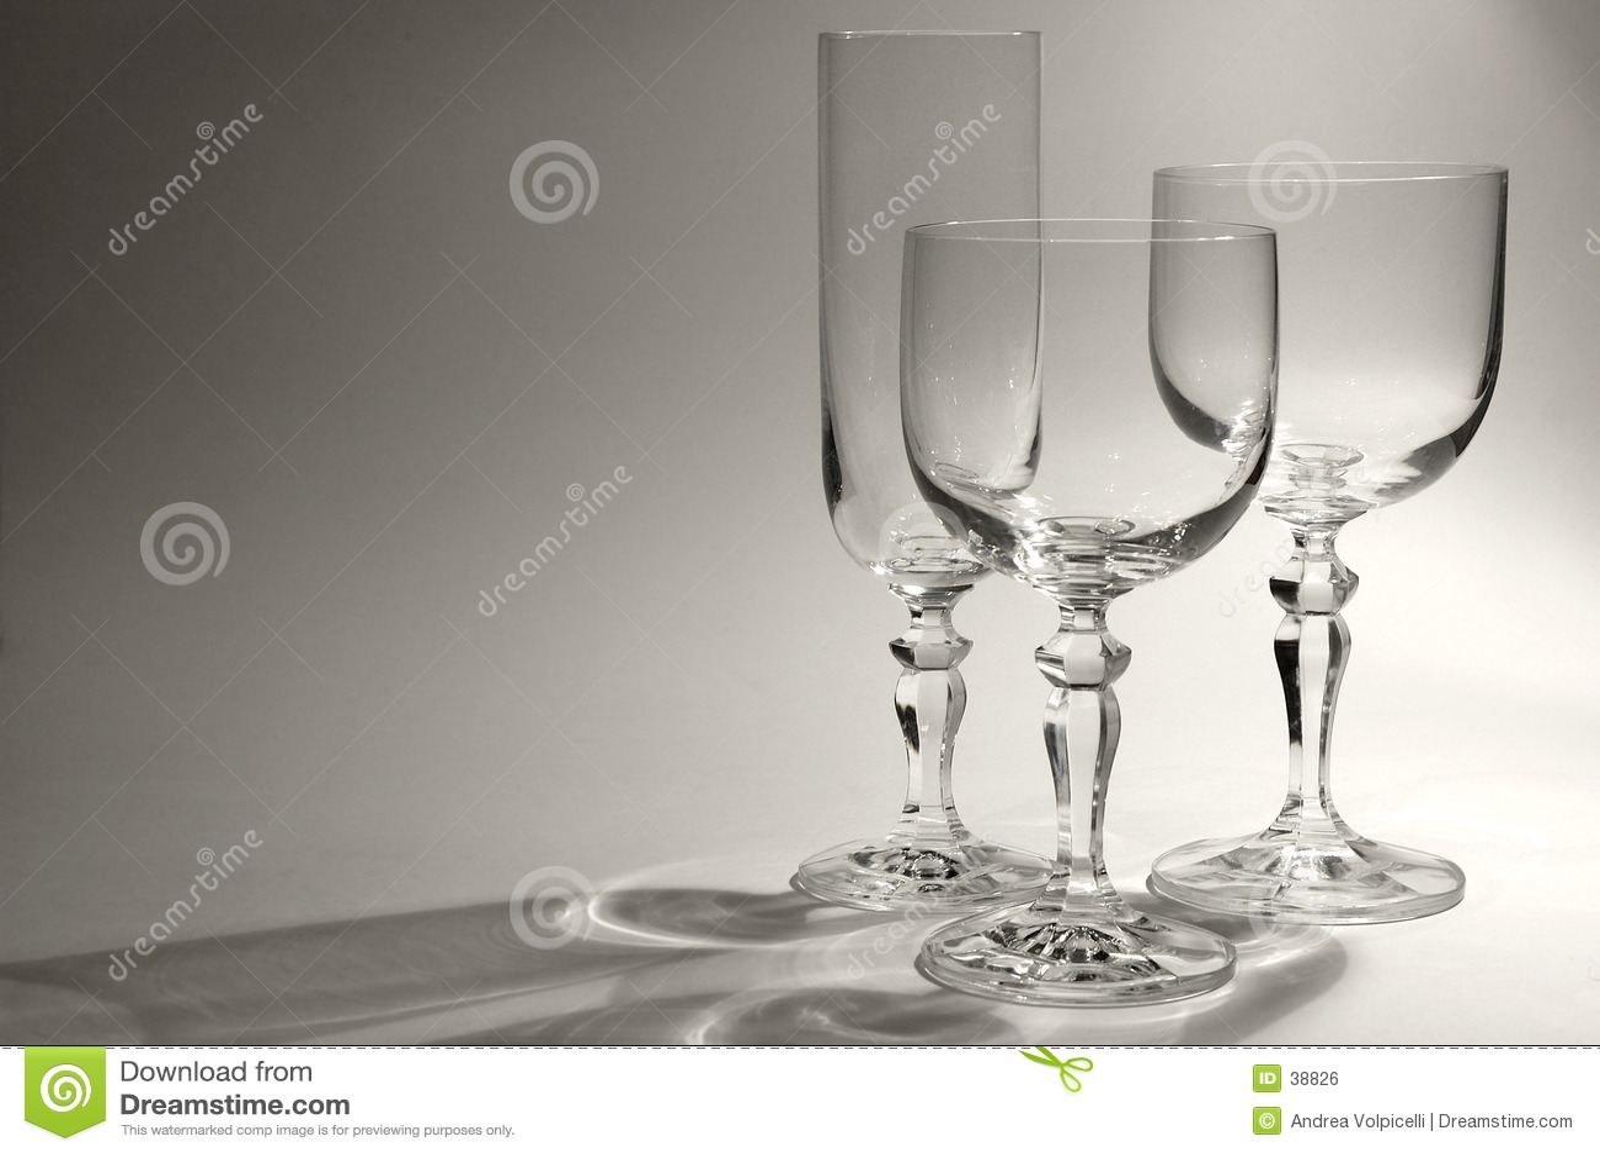 Different Glasses